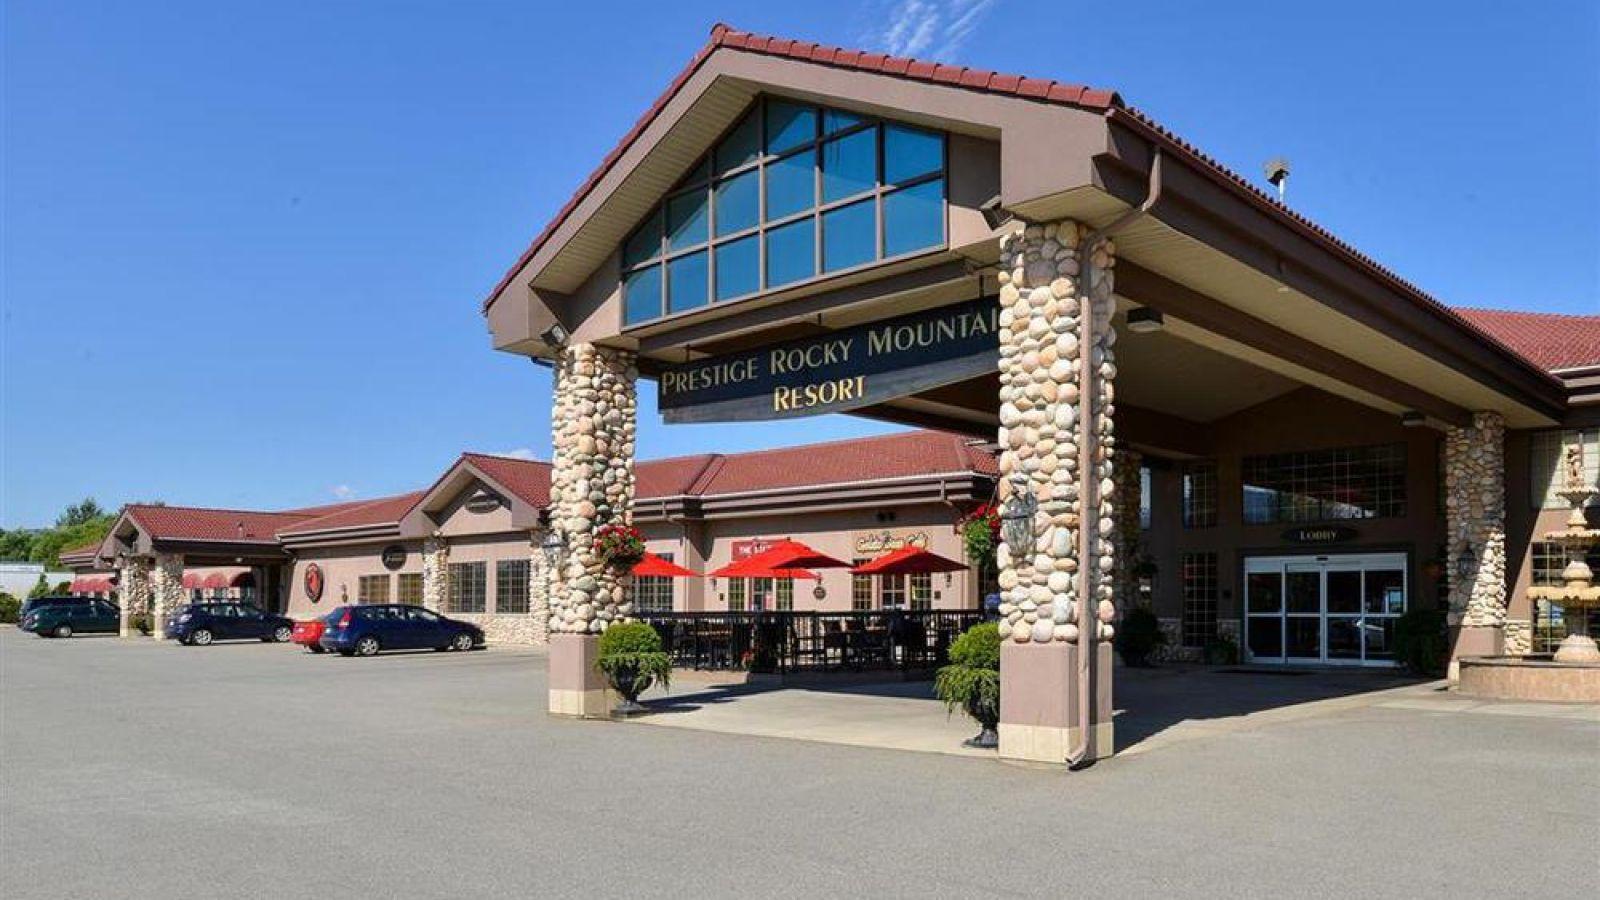 Prestige Rocky Mountain Resort Cranbrook - Kimberley golf packages